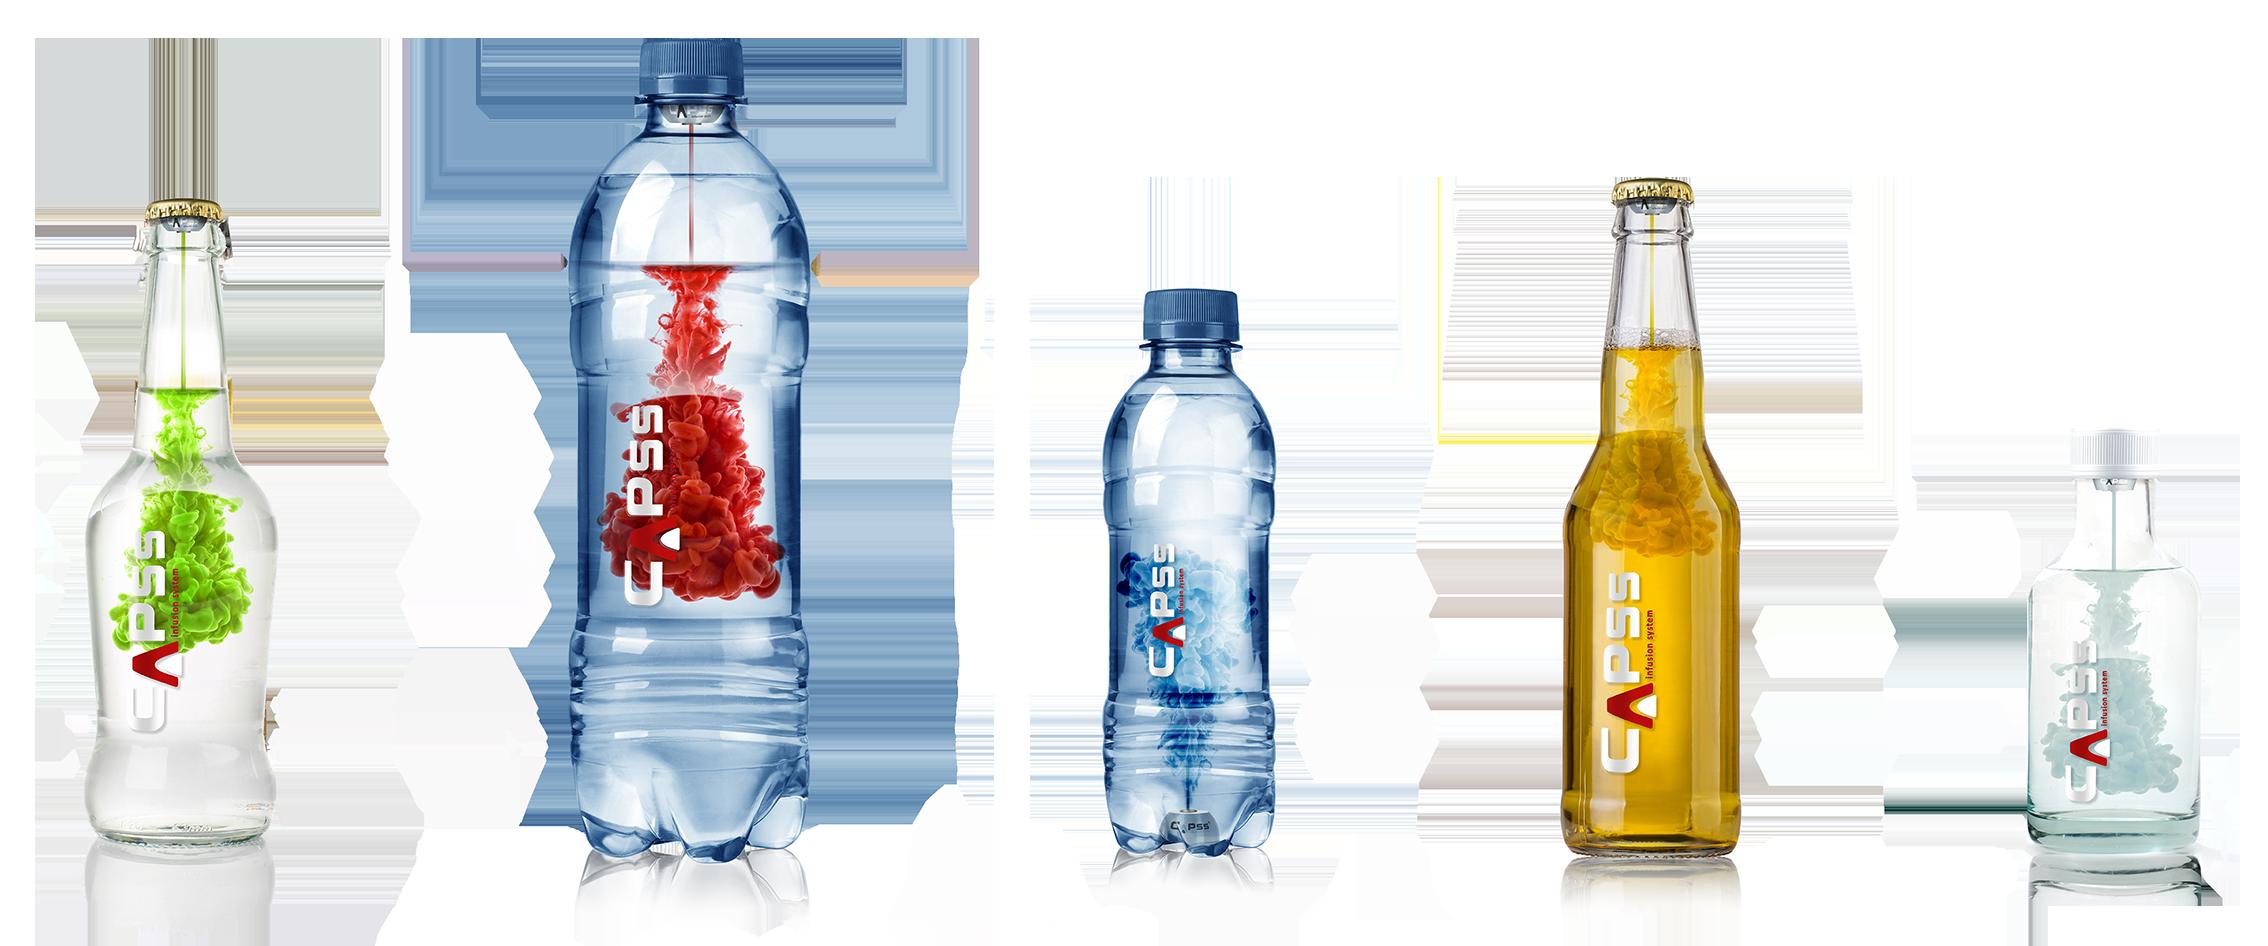 Capps_Bottle_designs_1